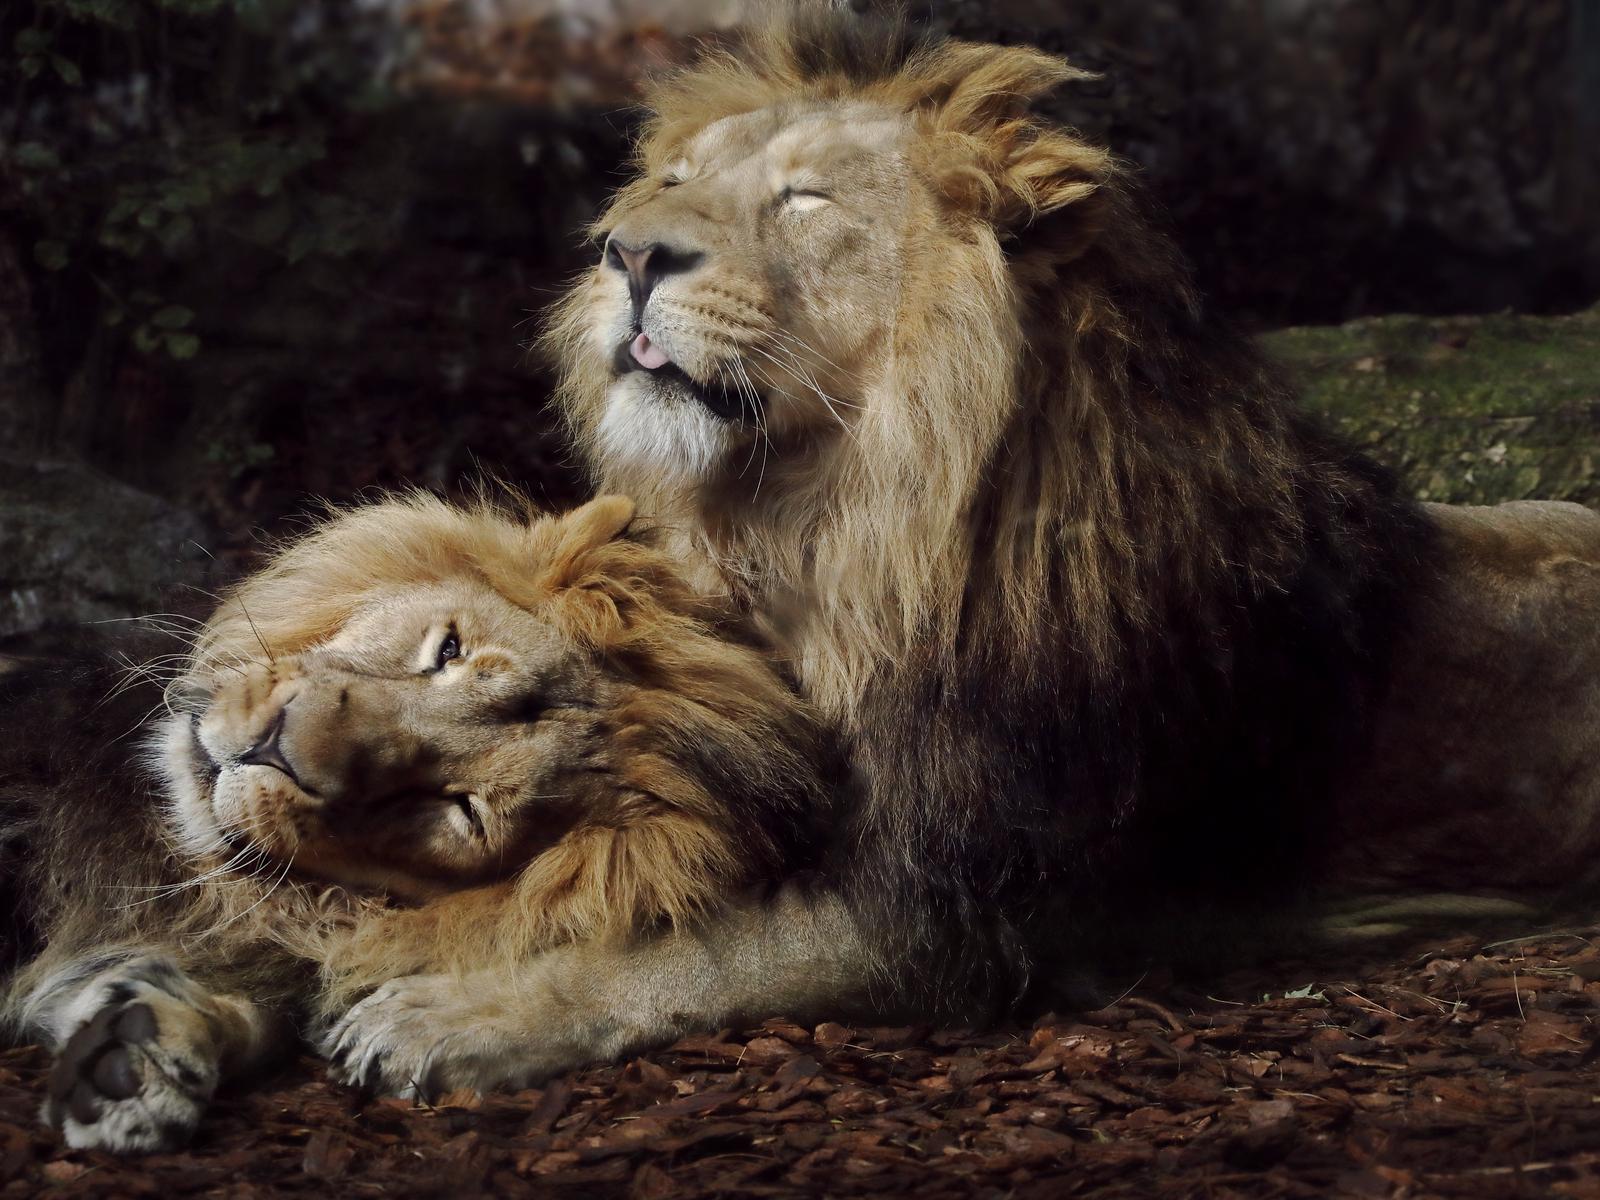 joyful-lions-lc.jpg